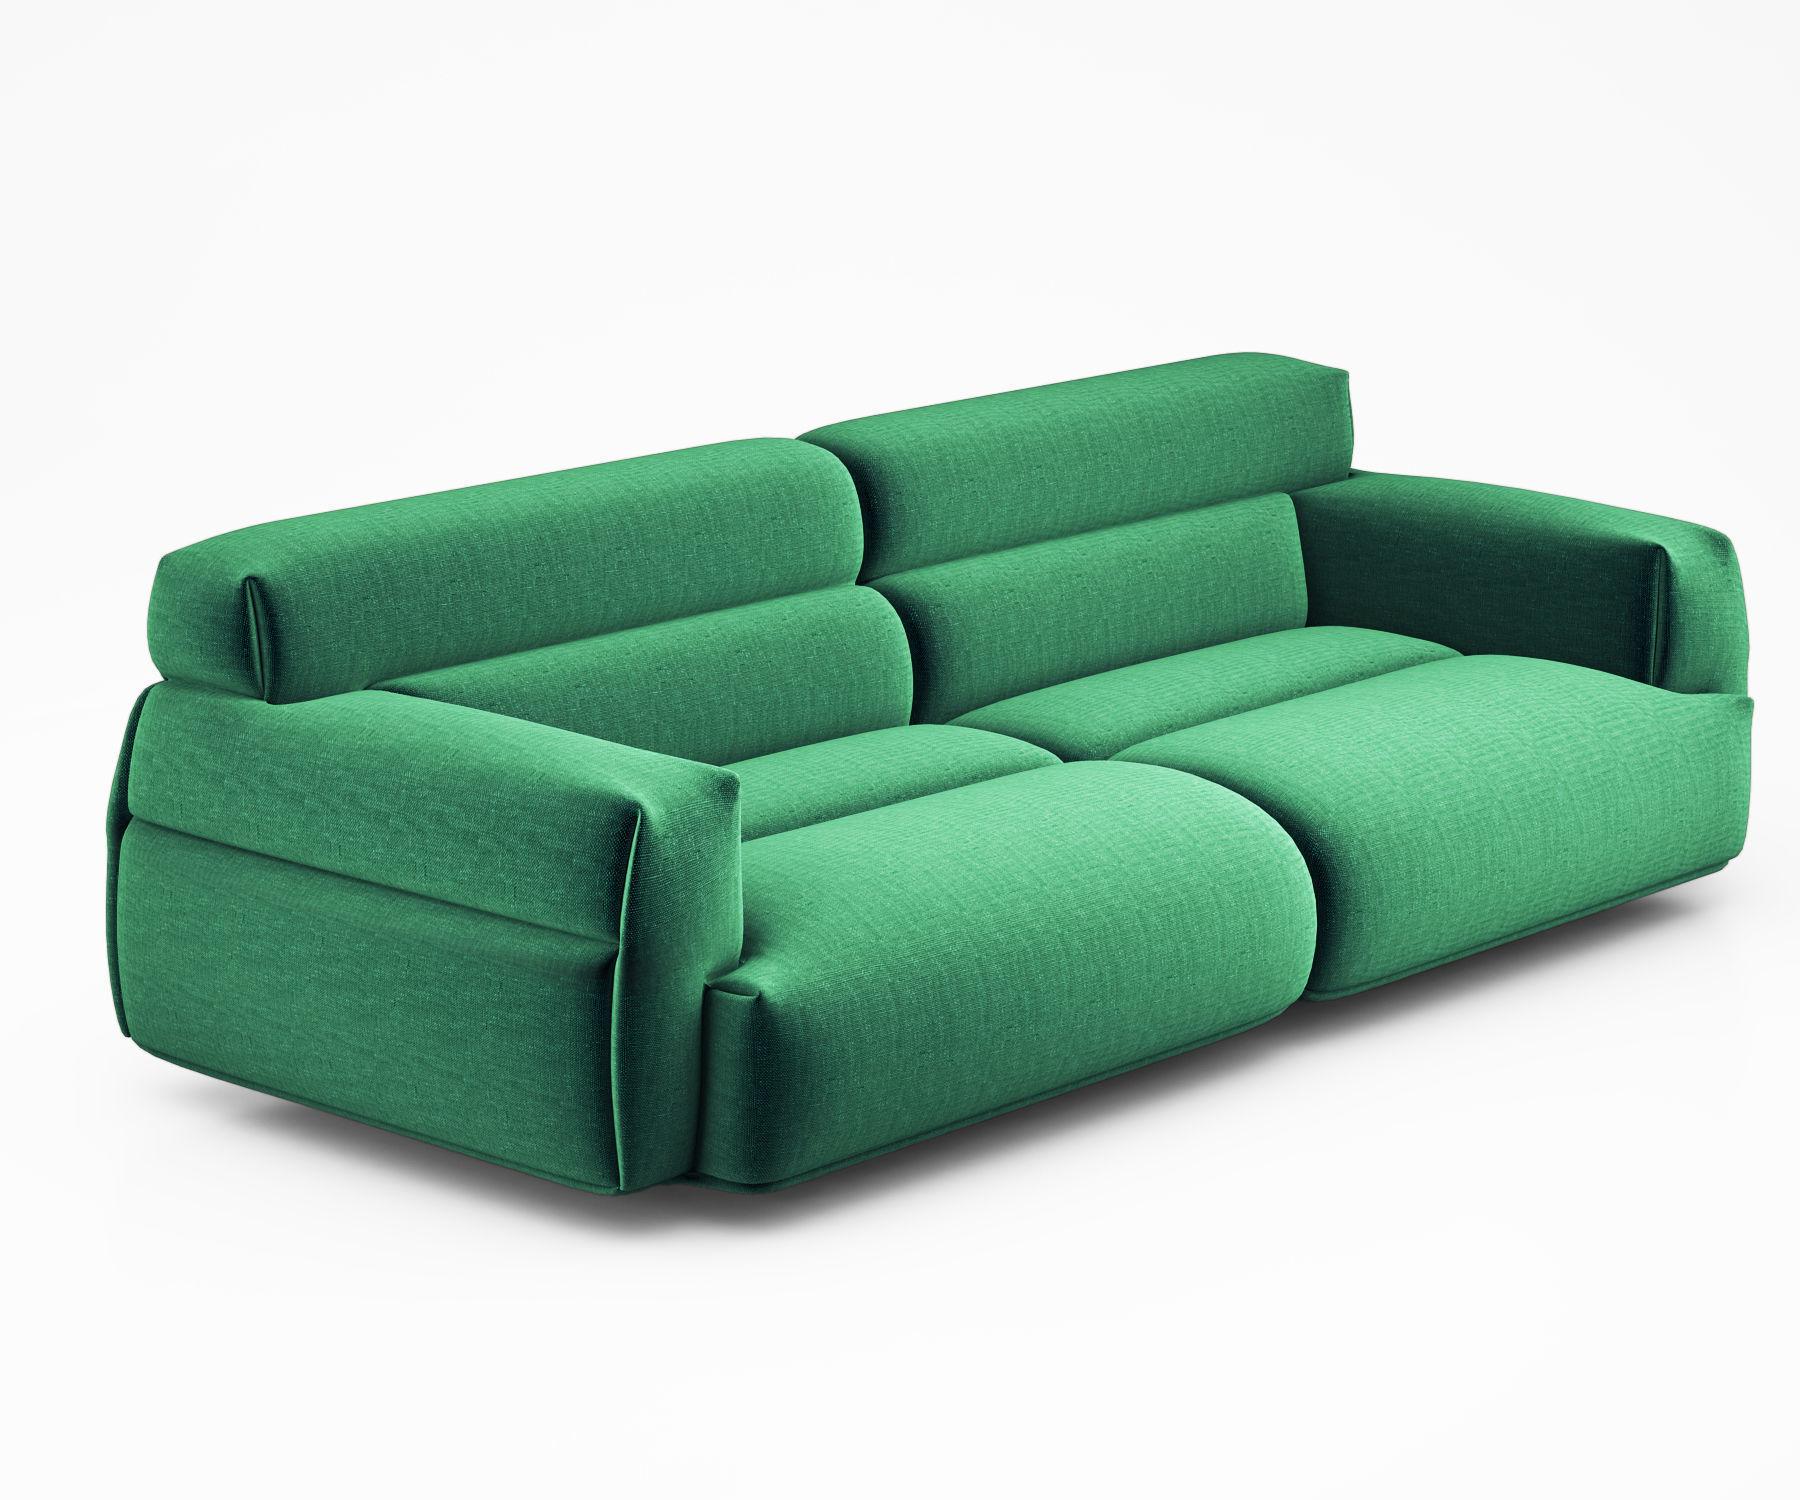 Valley sofa by Jardan